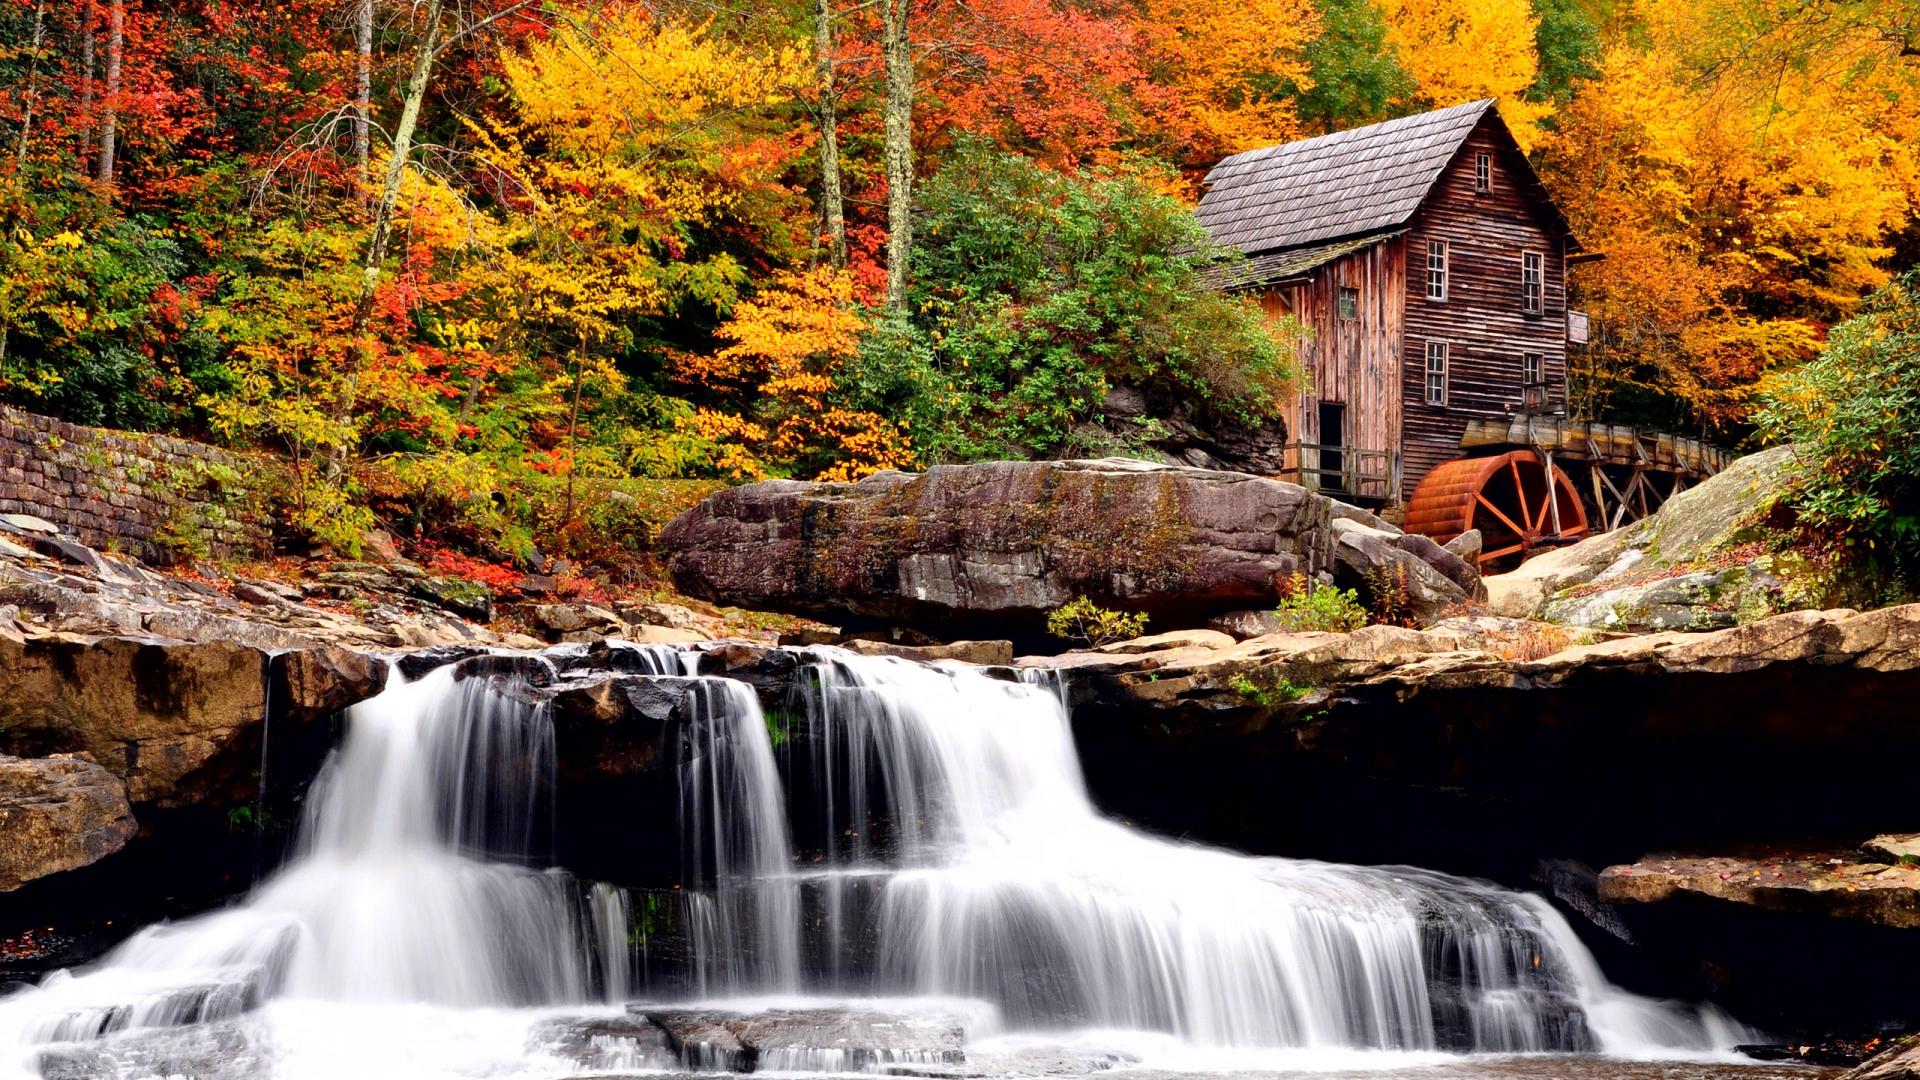 Fall Nature HD Wallpapers – Free wallpaper download